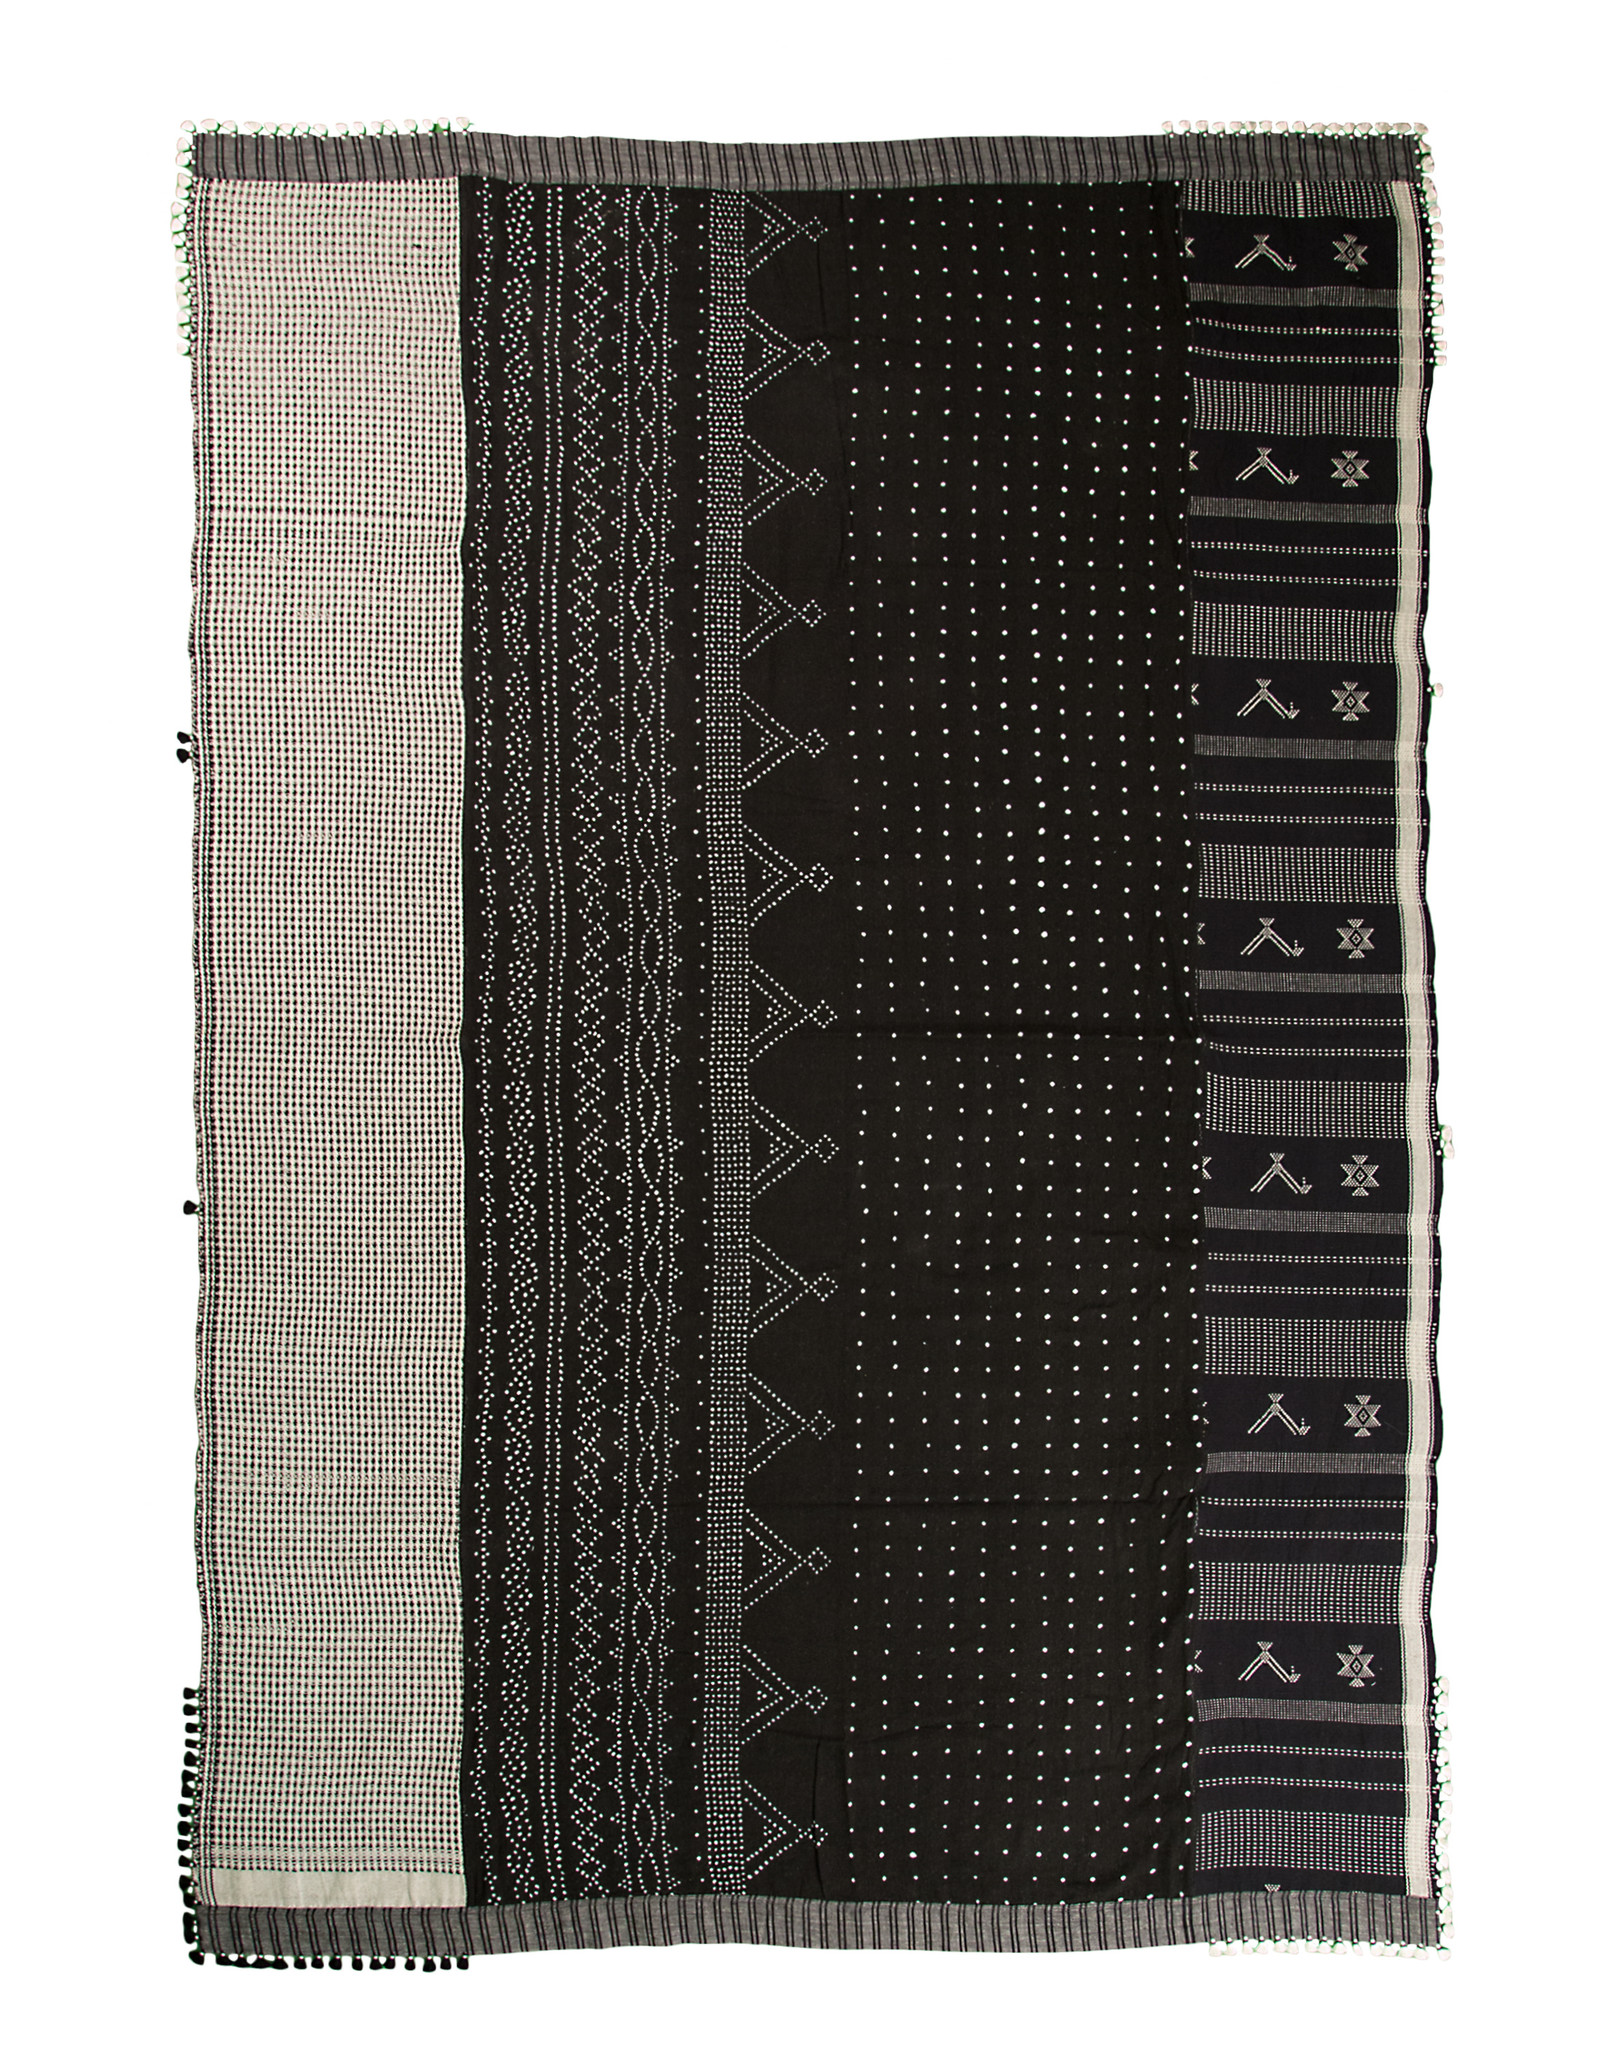 INJIRI Jat 5 Bed Cover/Tablecloth